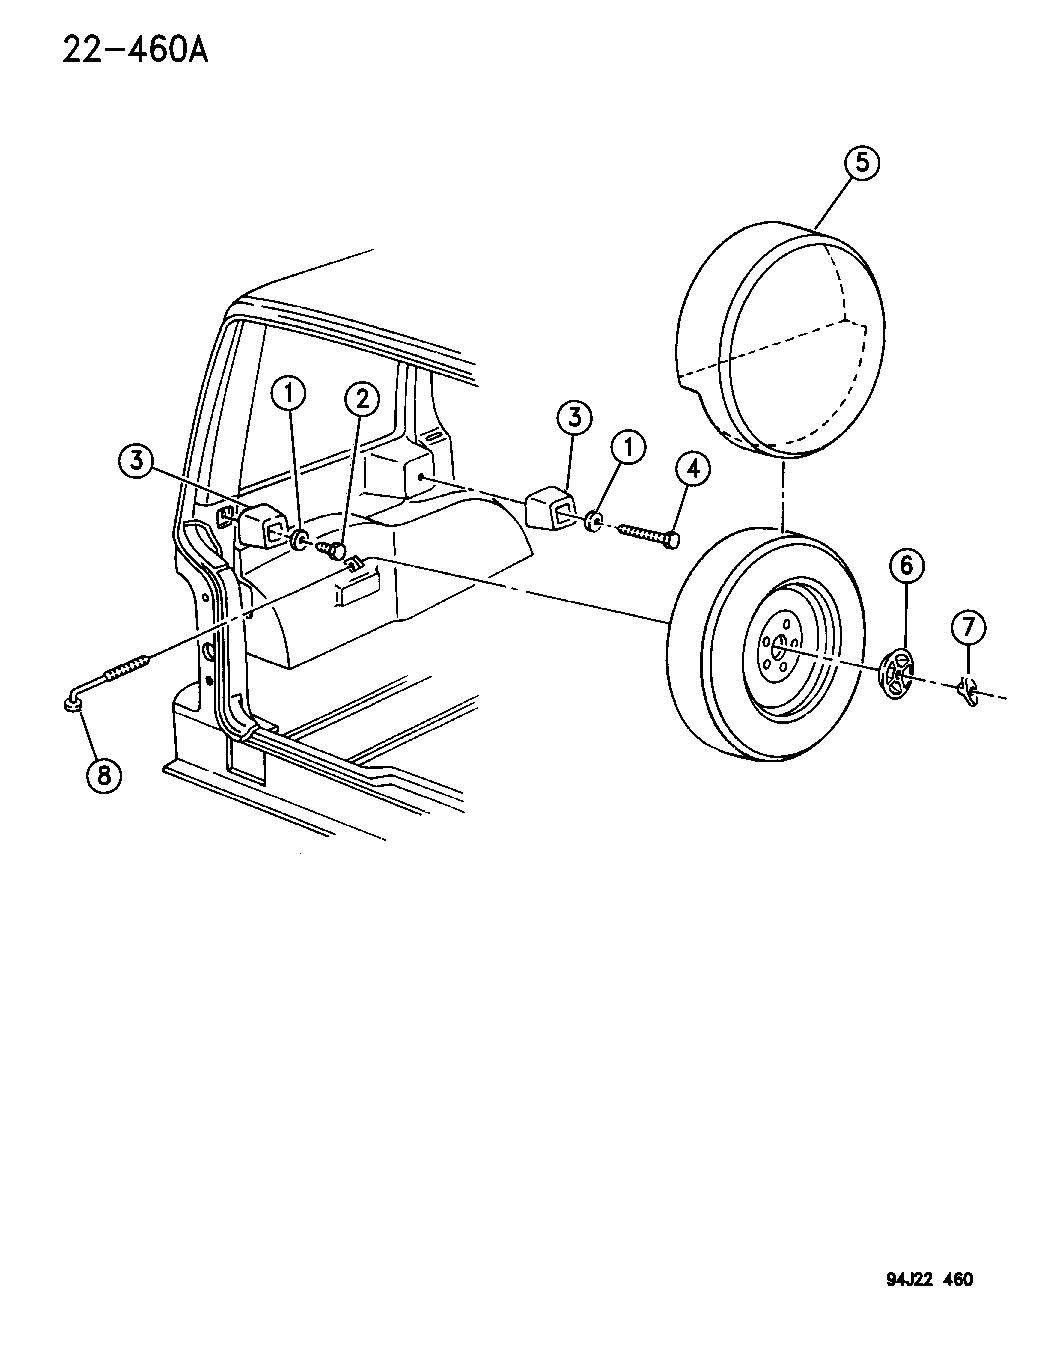 1995 jeep cherokee engine diagram 1995 jeep grand cherokee spare wheel  inside mounting  1995 jeep grand cherokee spare wheel